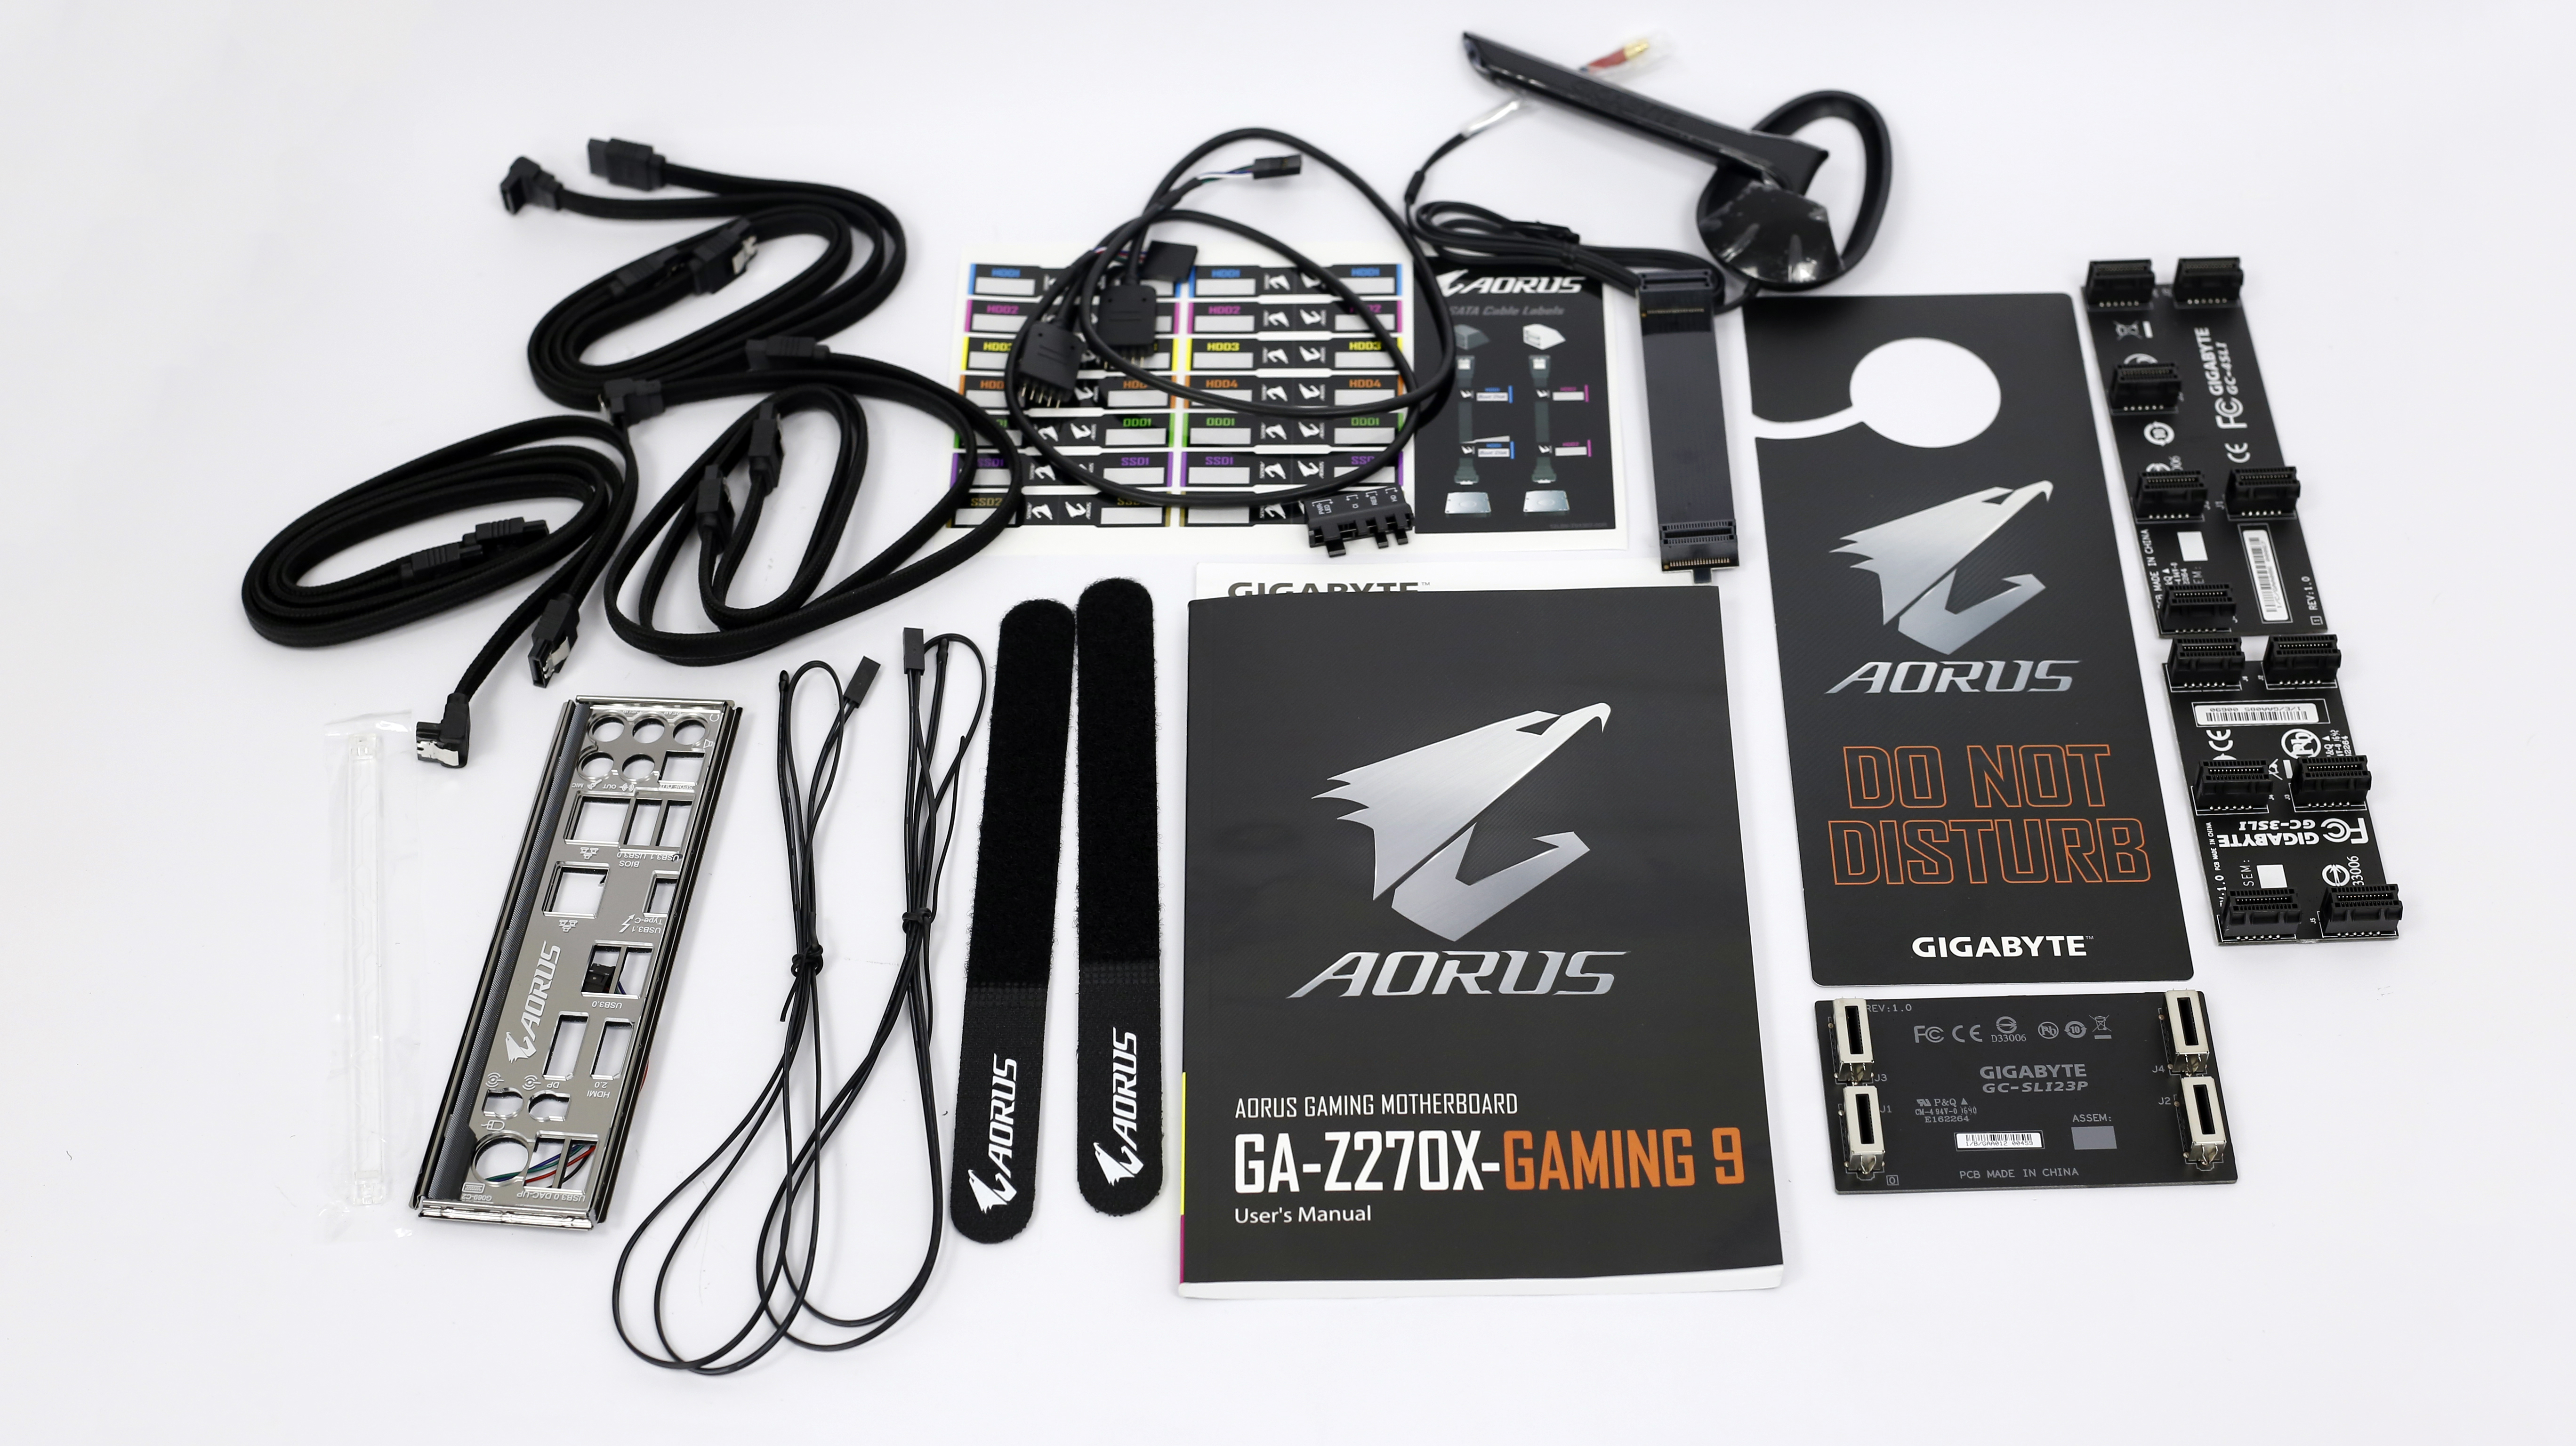 AORUS Z270X-Gaming 9